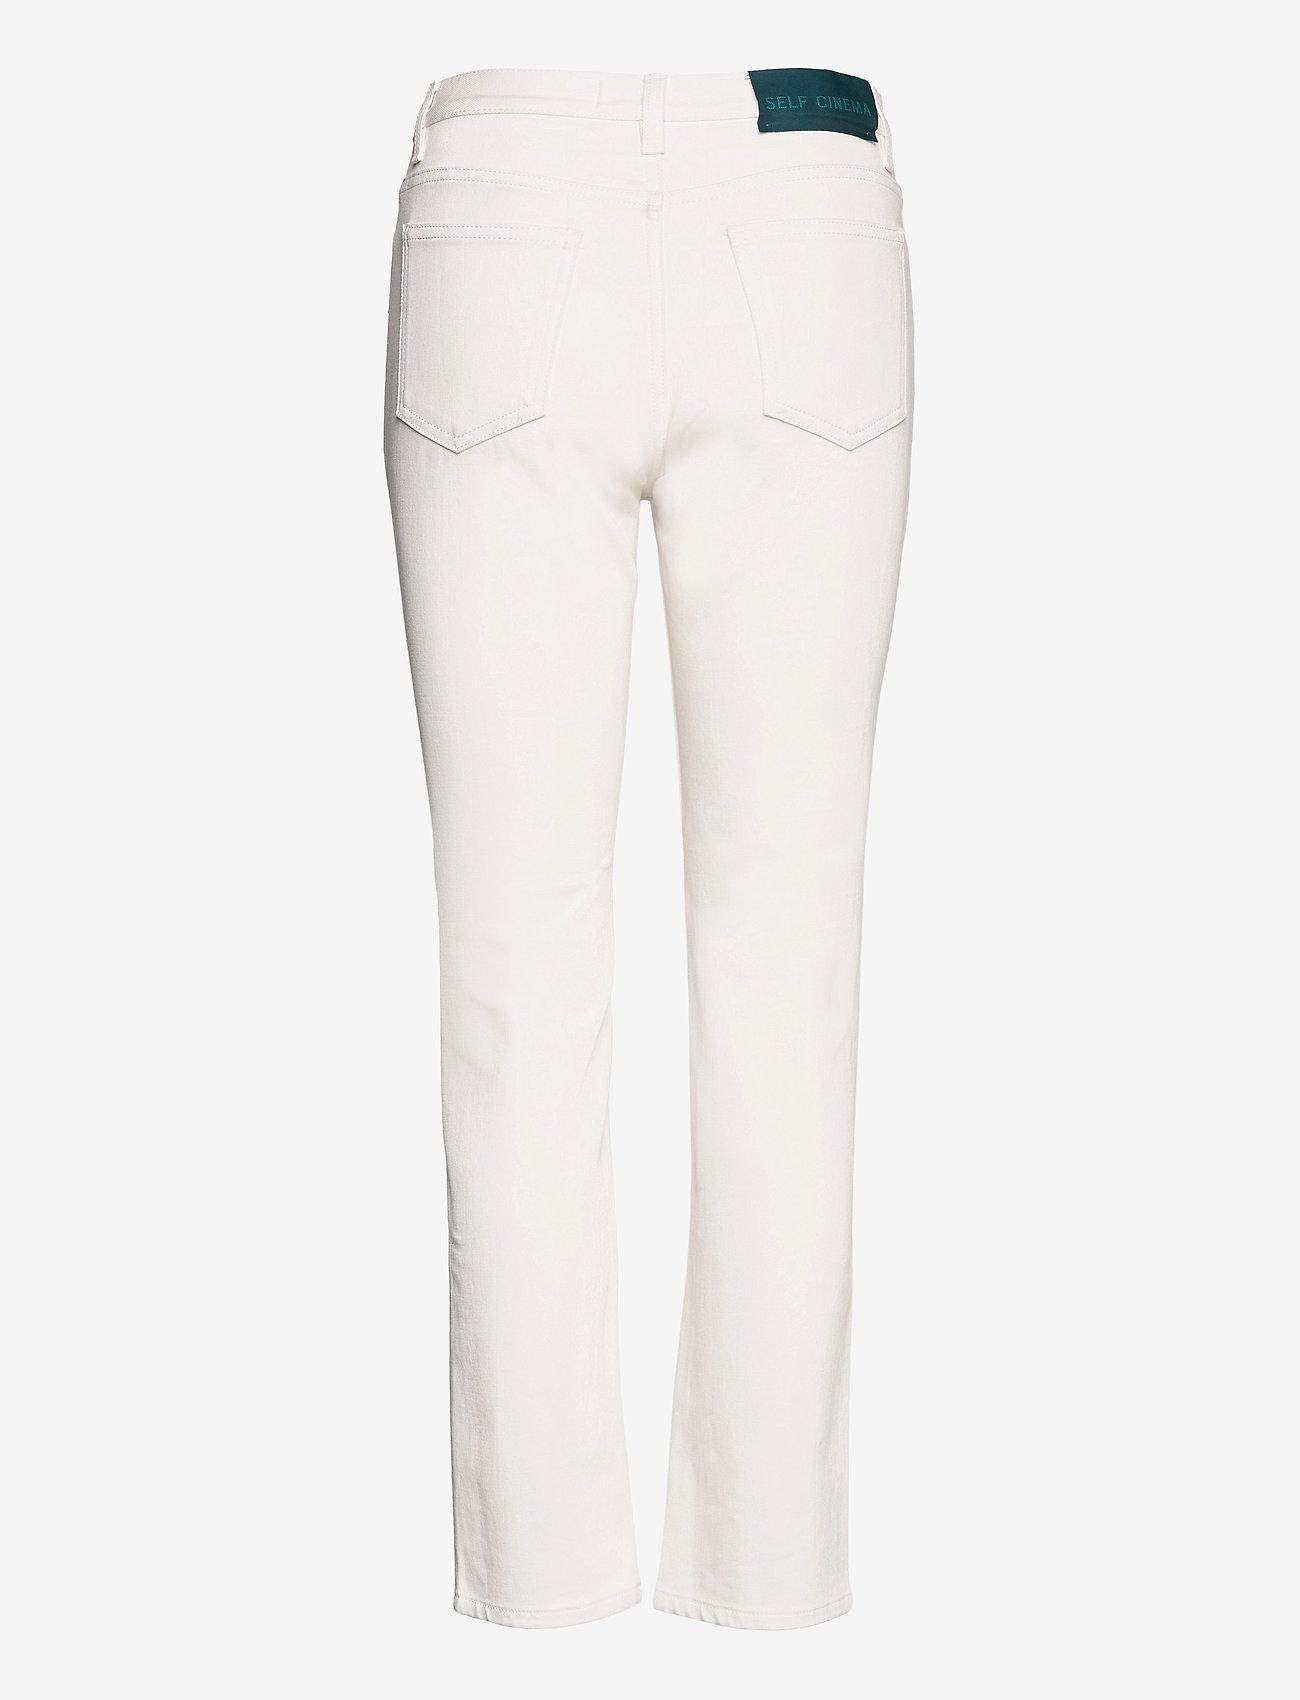 Self Cinema - Womens Slim Straight Jean - slim jeans - white - 1